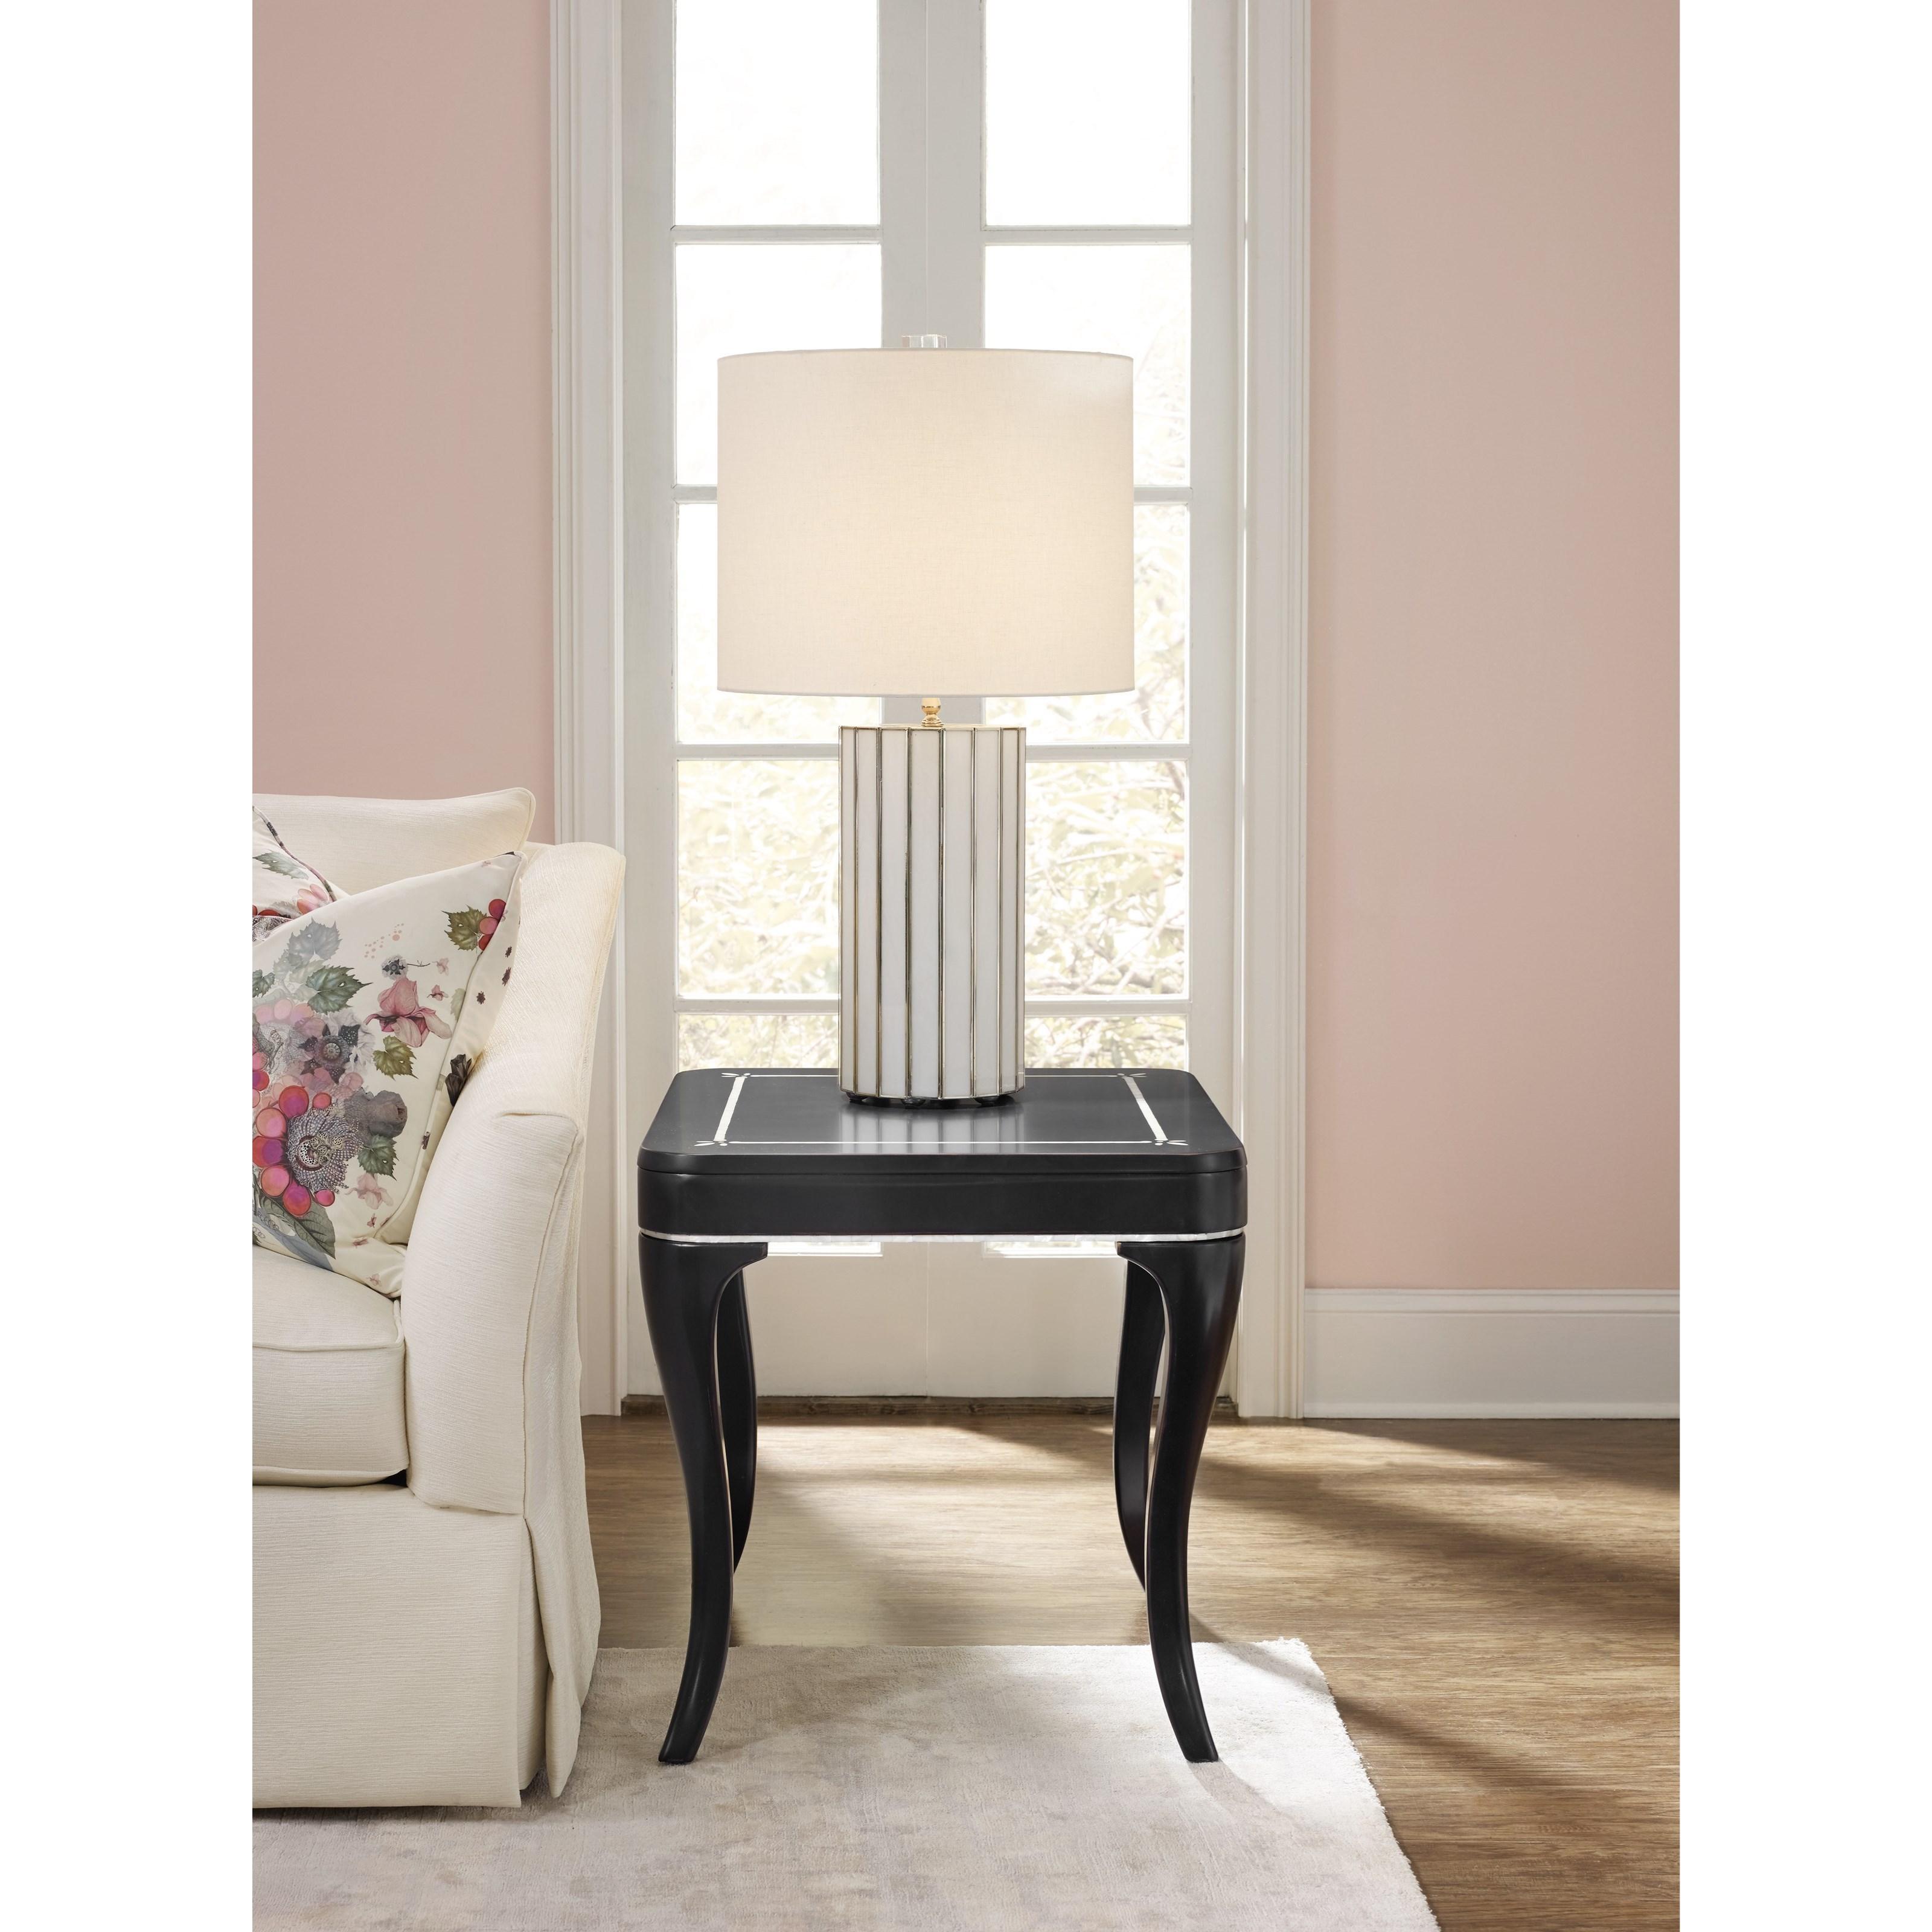 Cynthia Rowley For Hooker Furniture Cynthia Rowley Pretty Flirt End Table Belfort Furniture